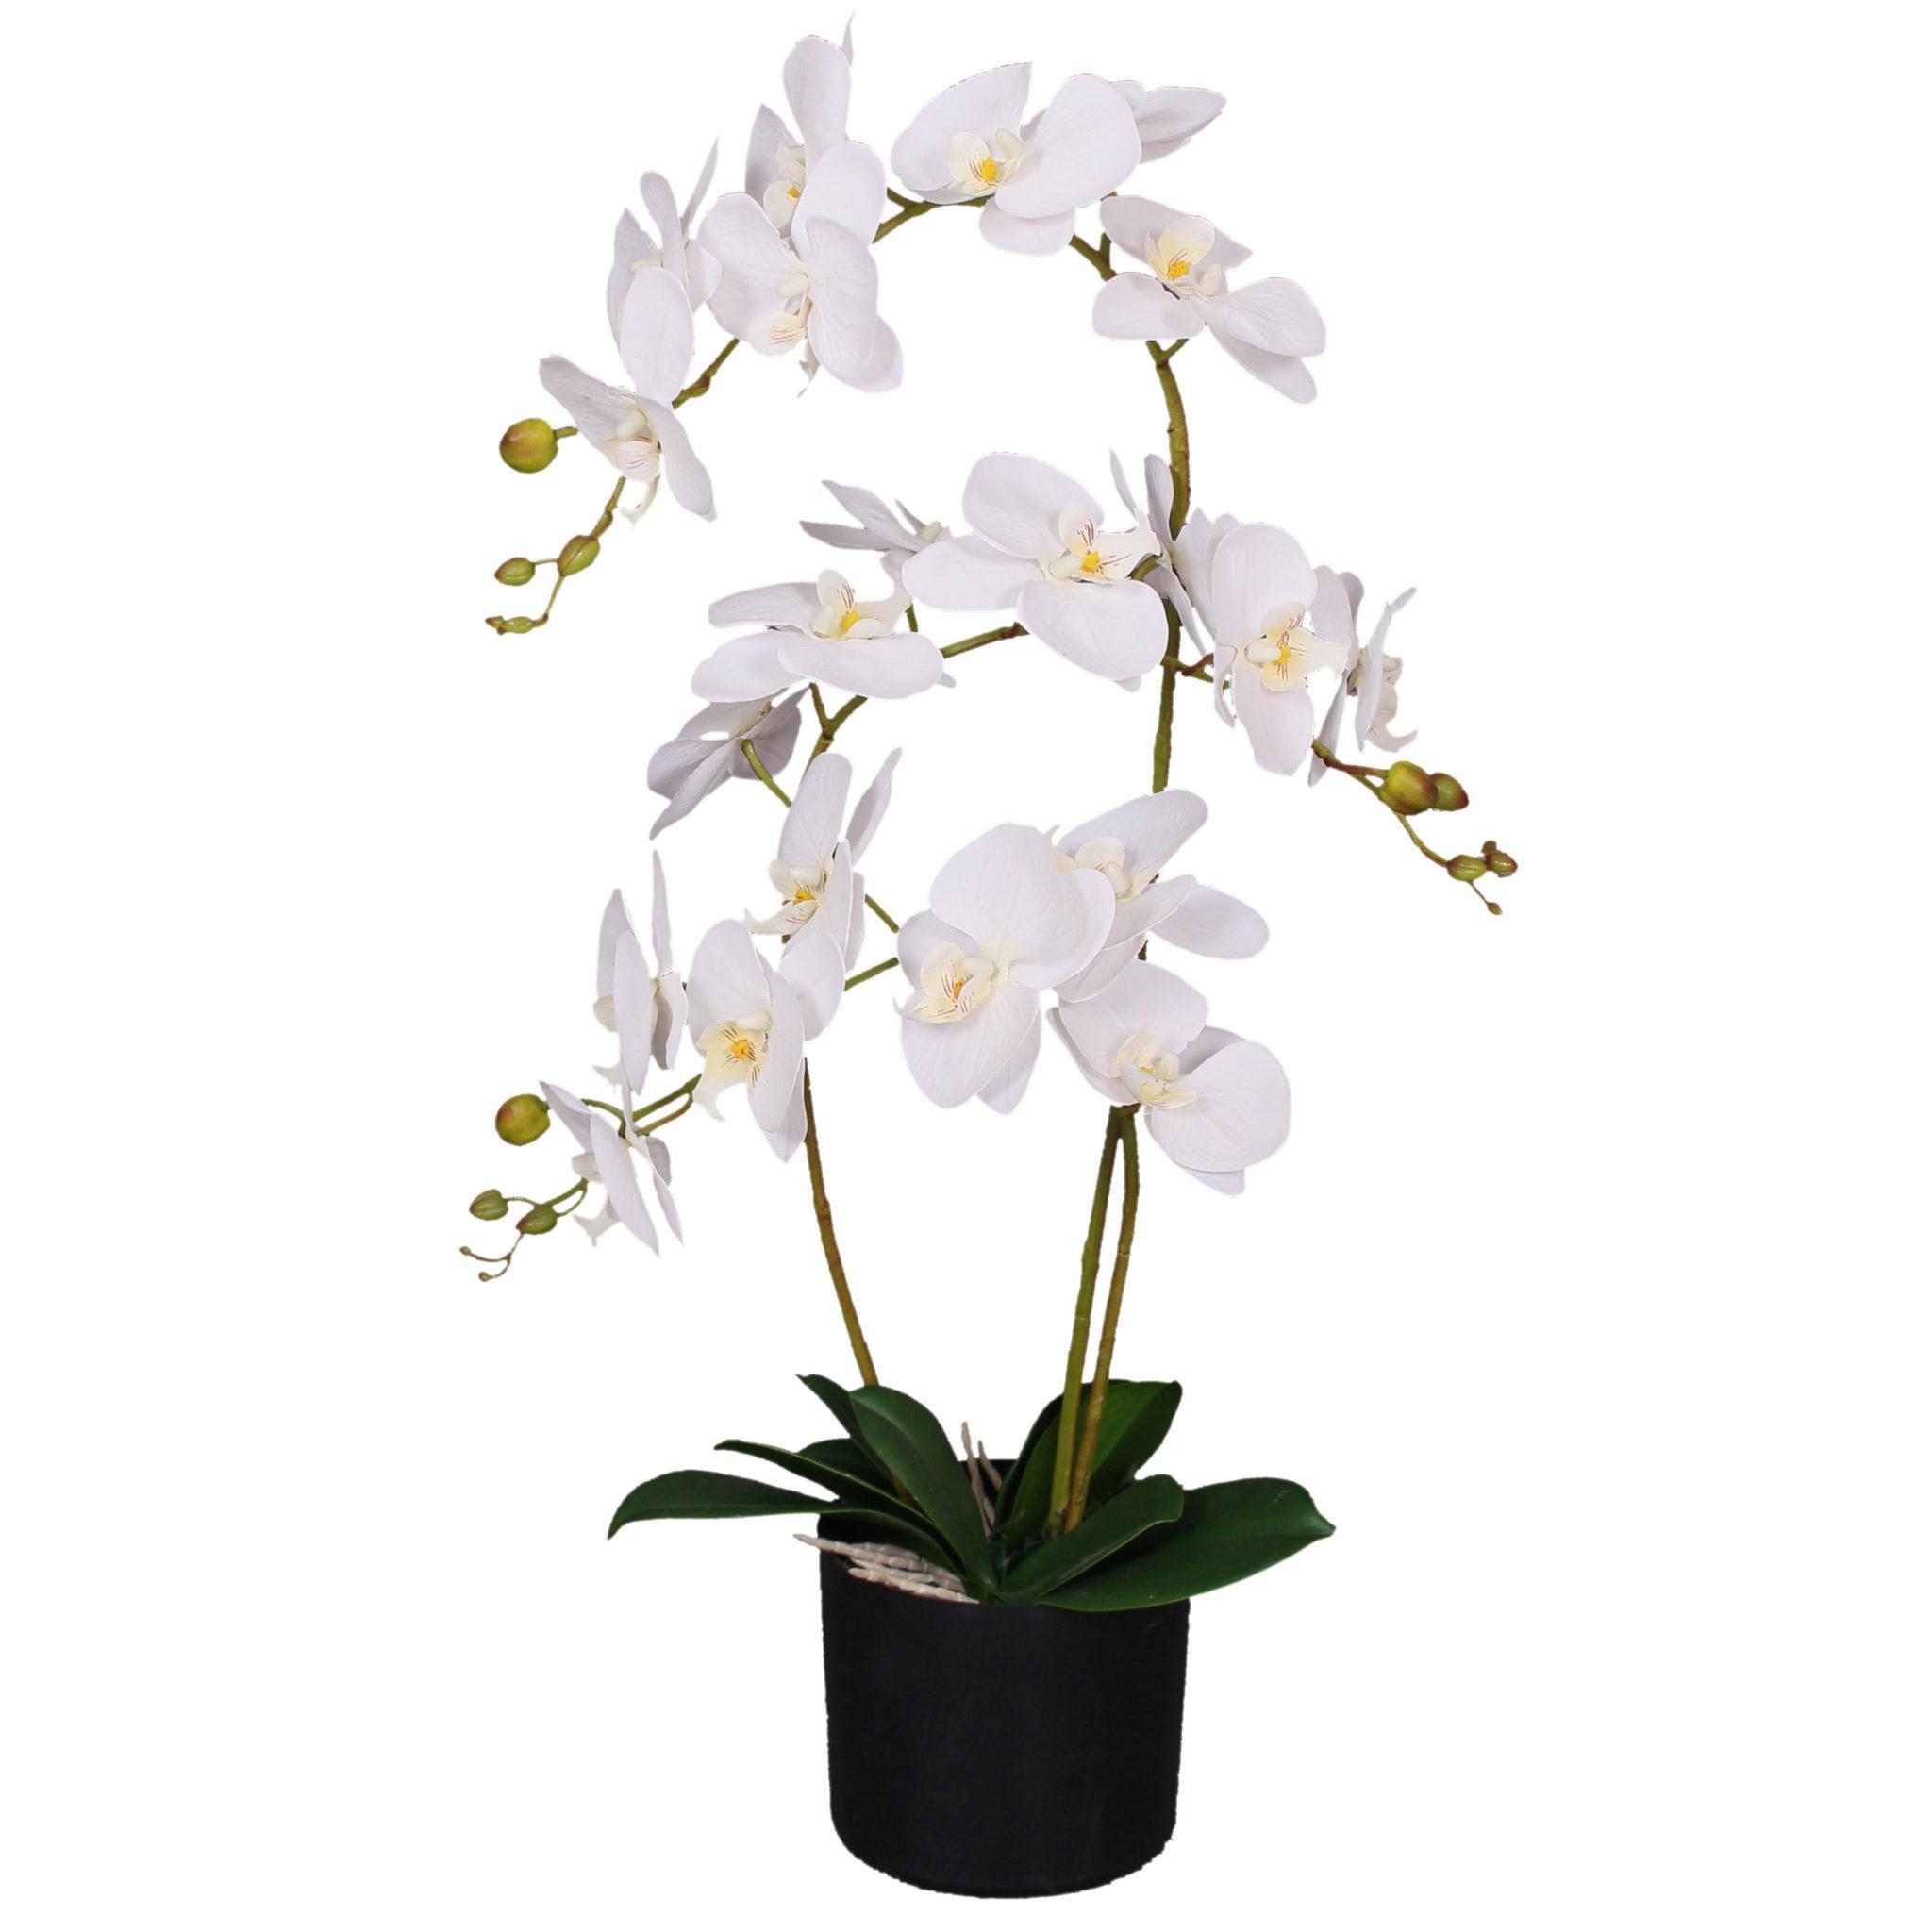 65cm Artificial Luxury Artificial Orchid